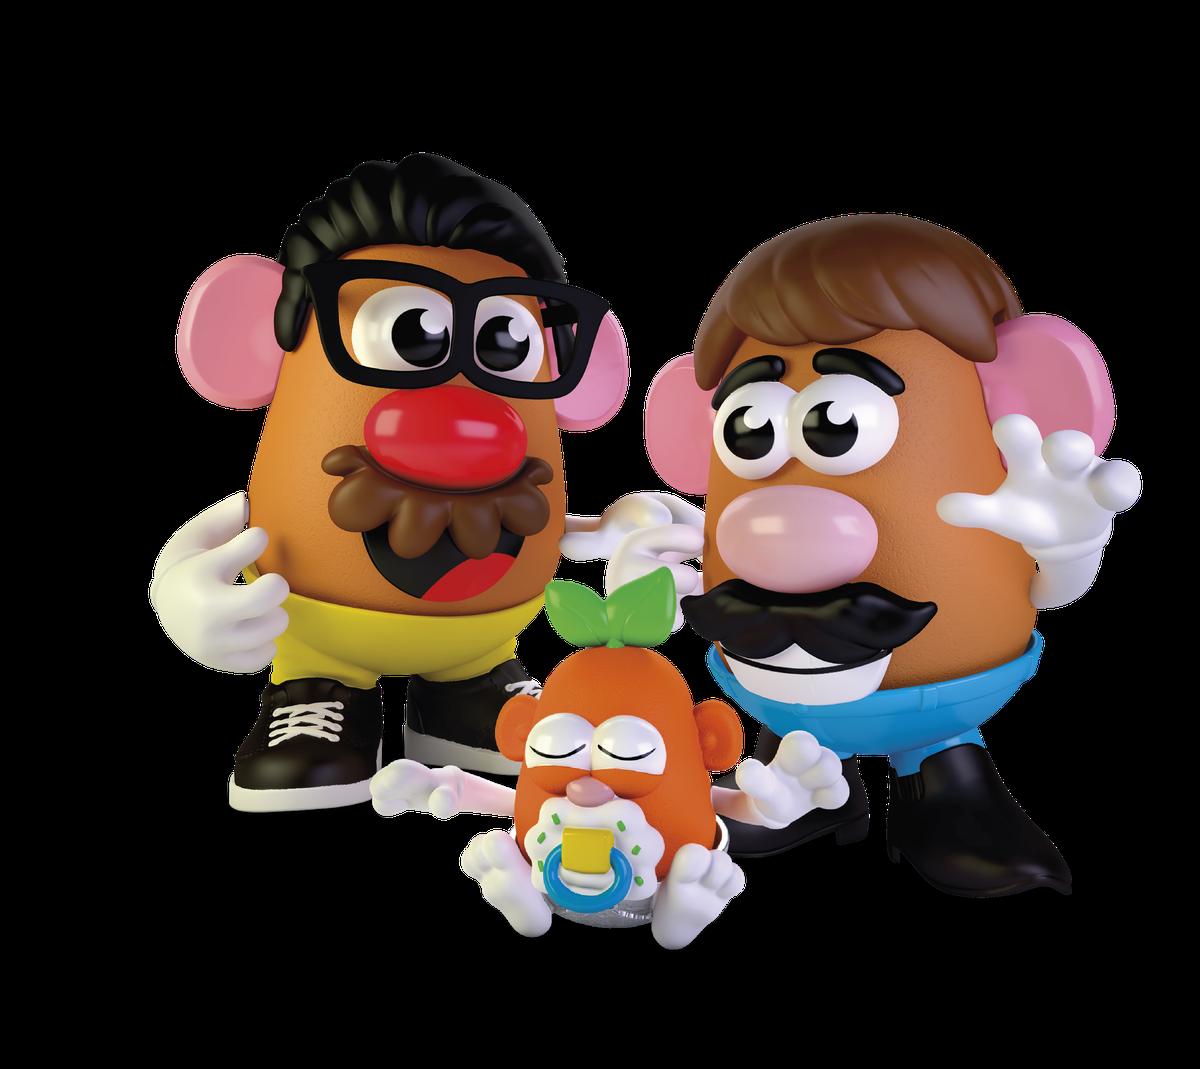 two potato dads with a potato child